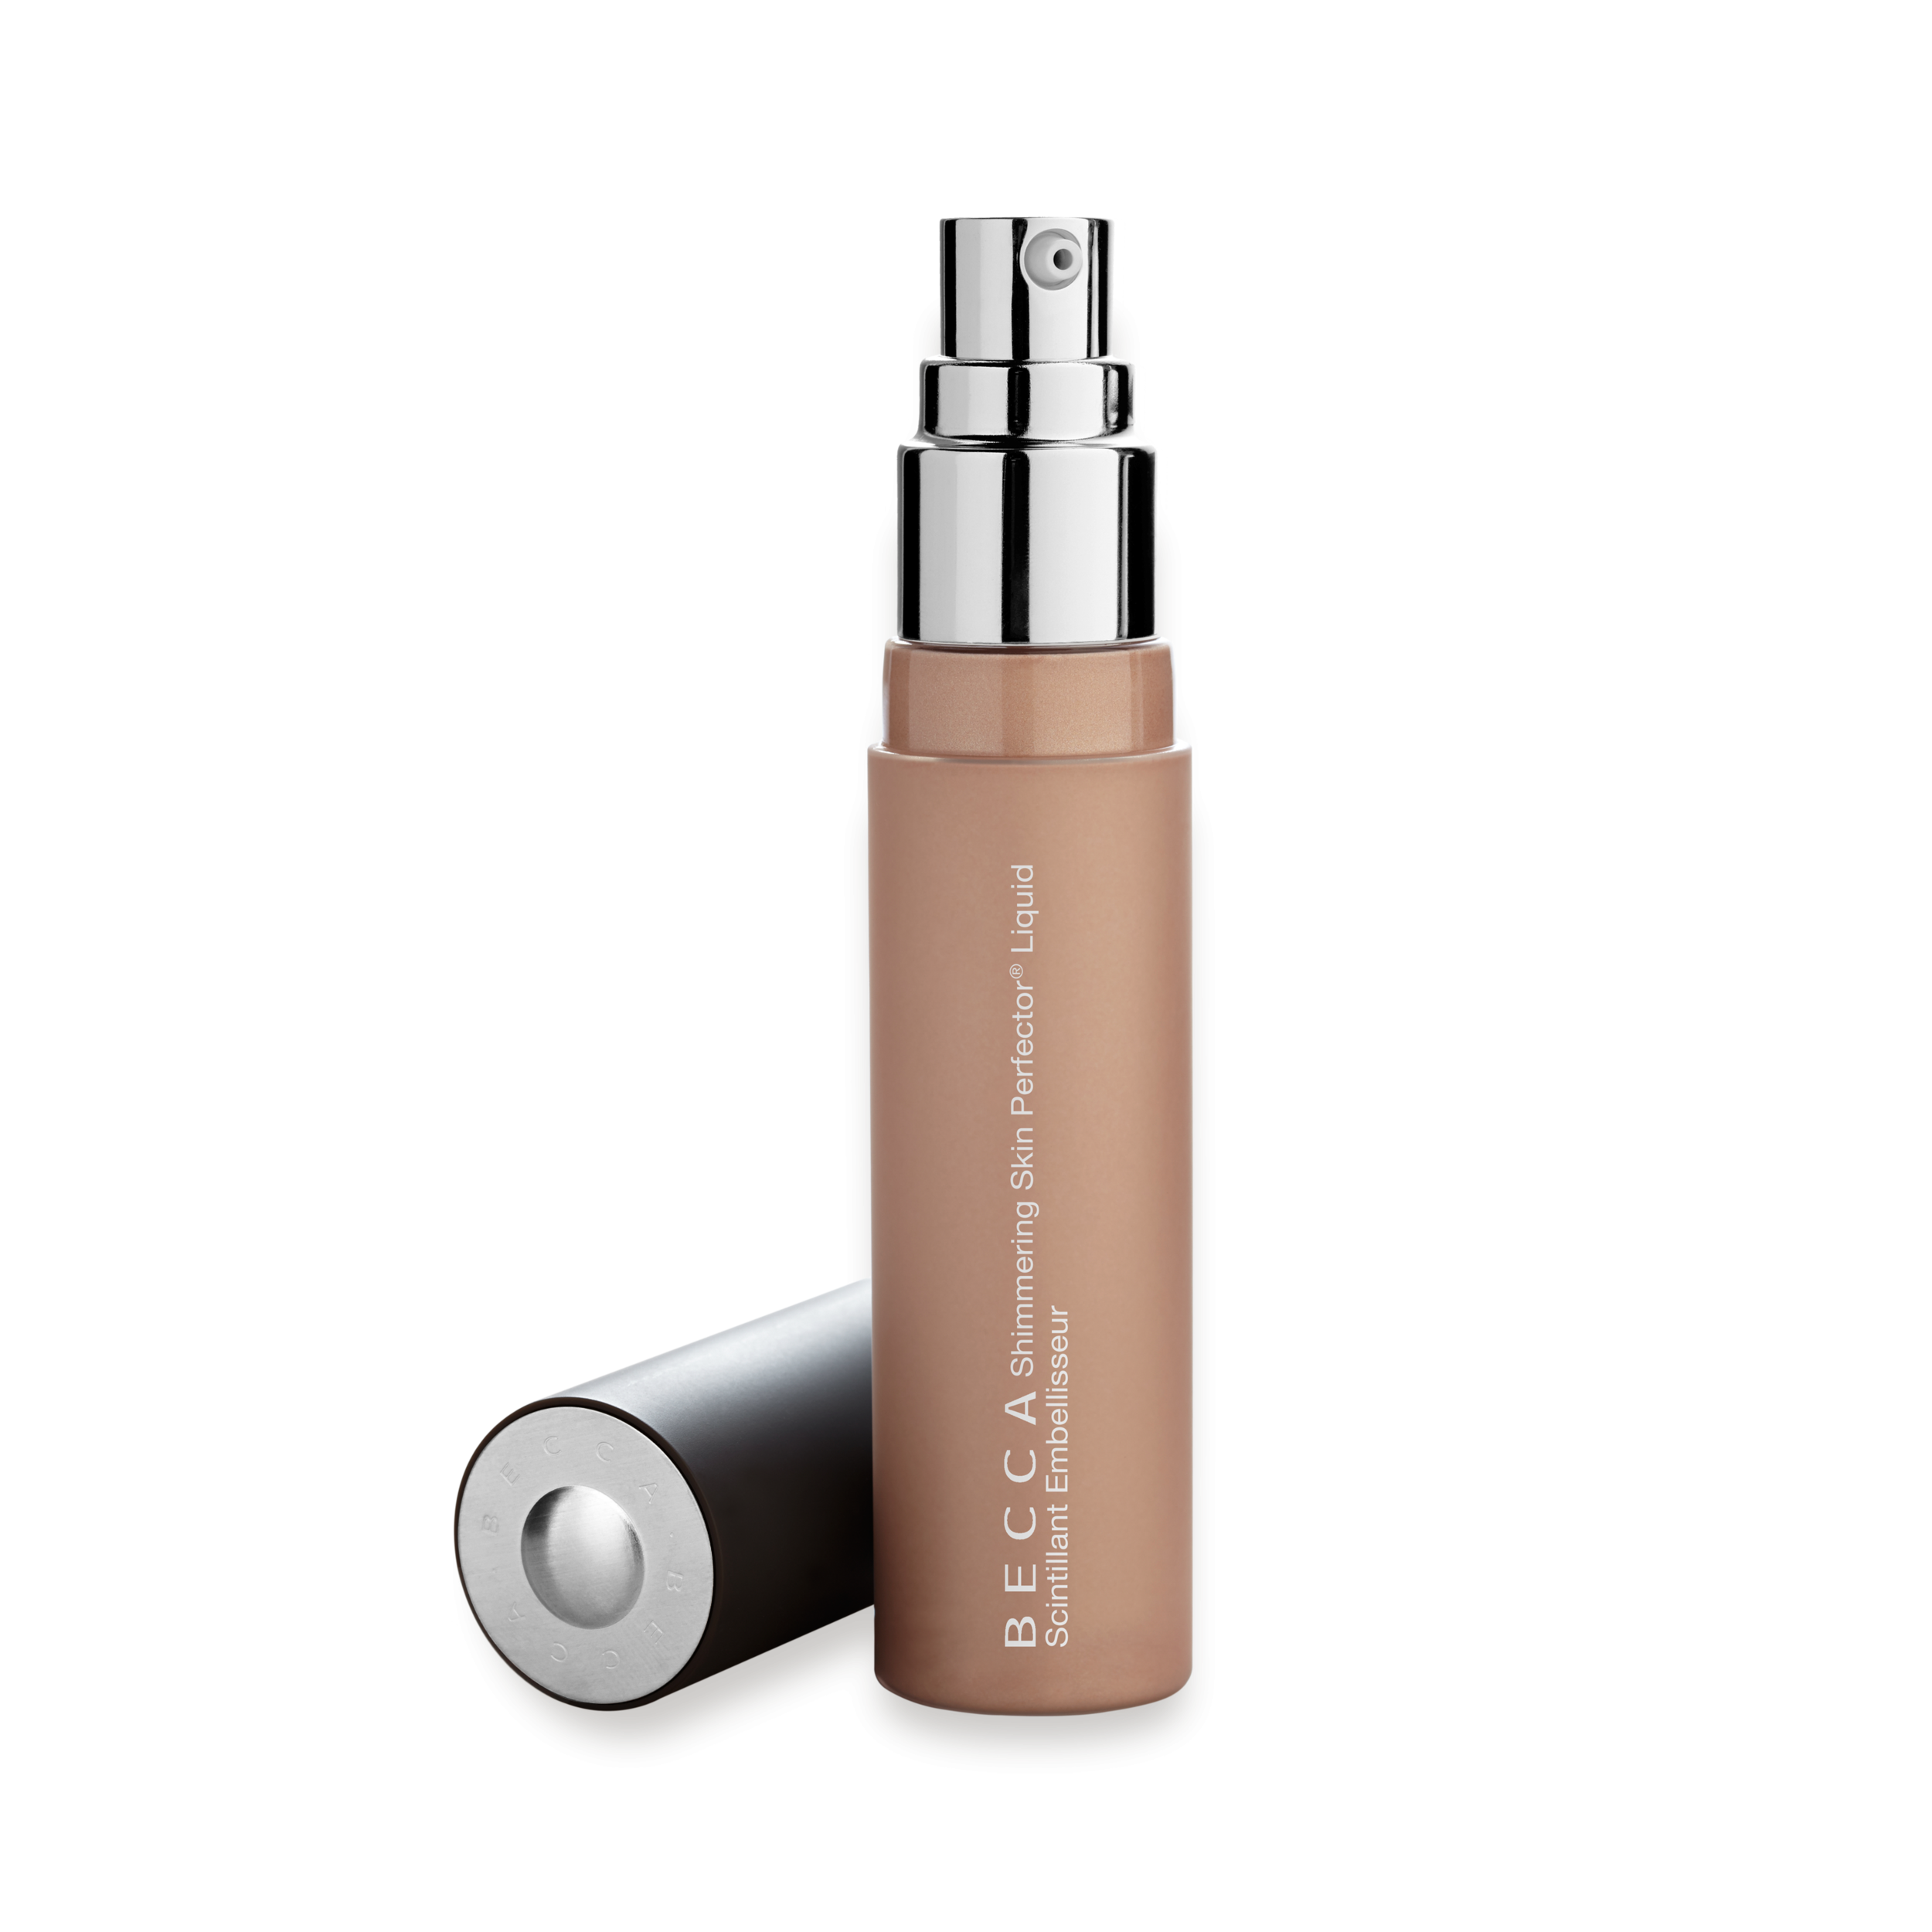 Shimmering Skin Perfector Liquid: Becca